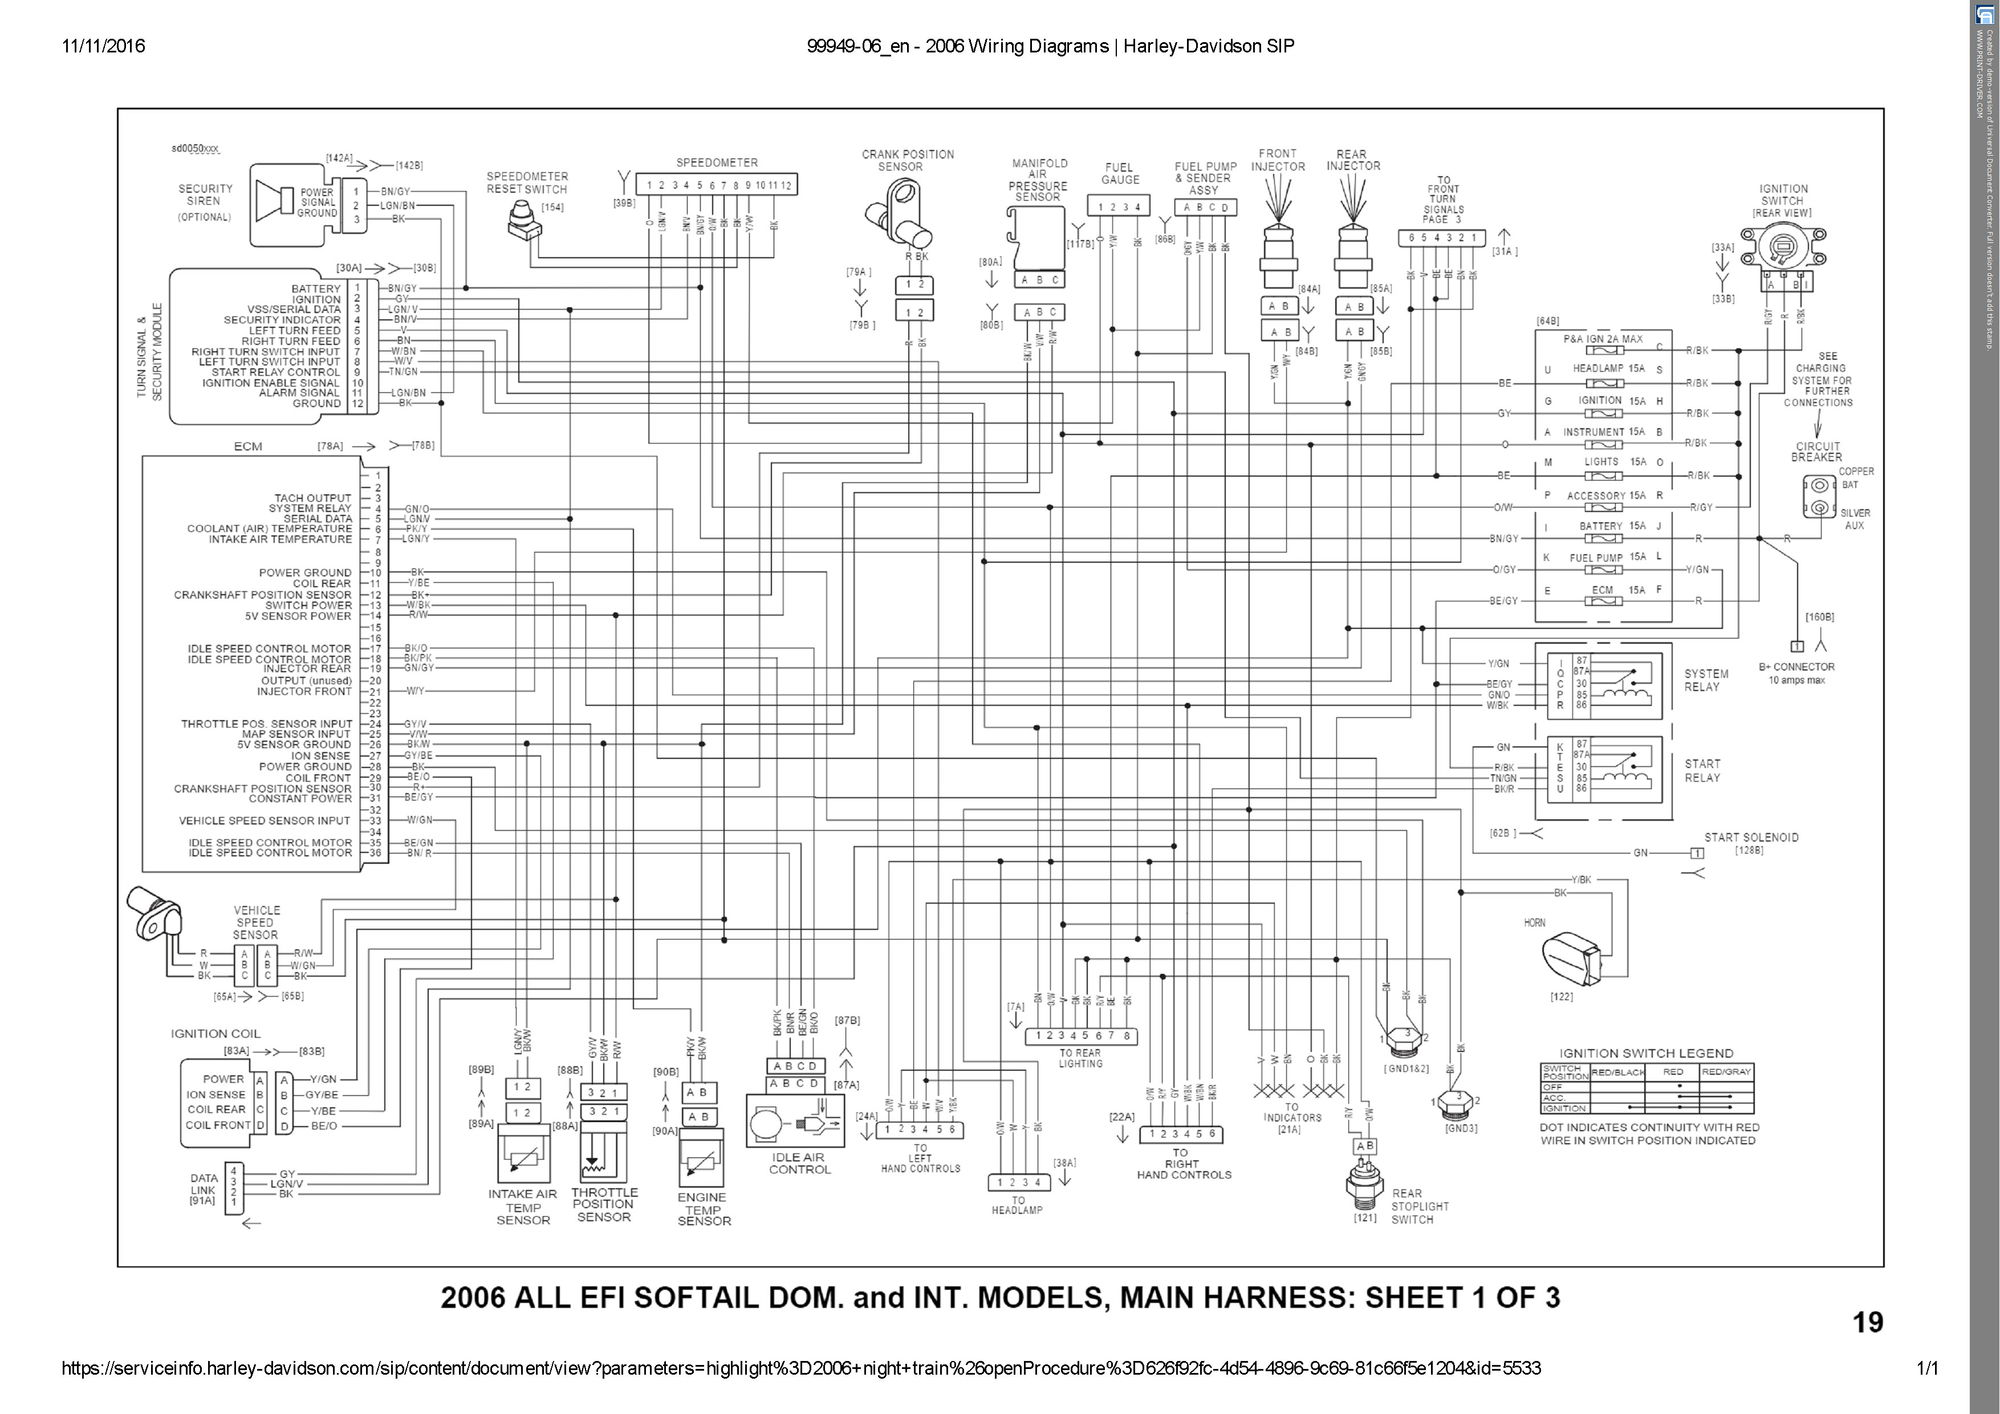 2005 harley davidson softail wiring diagram bms system 02 auto